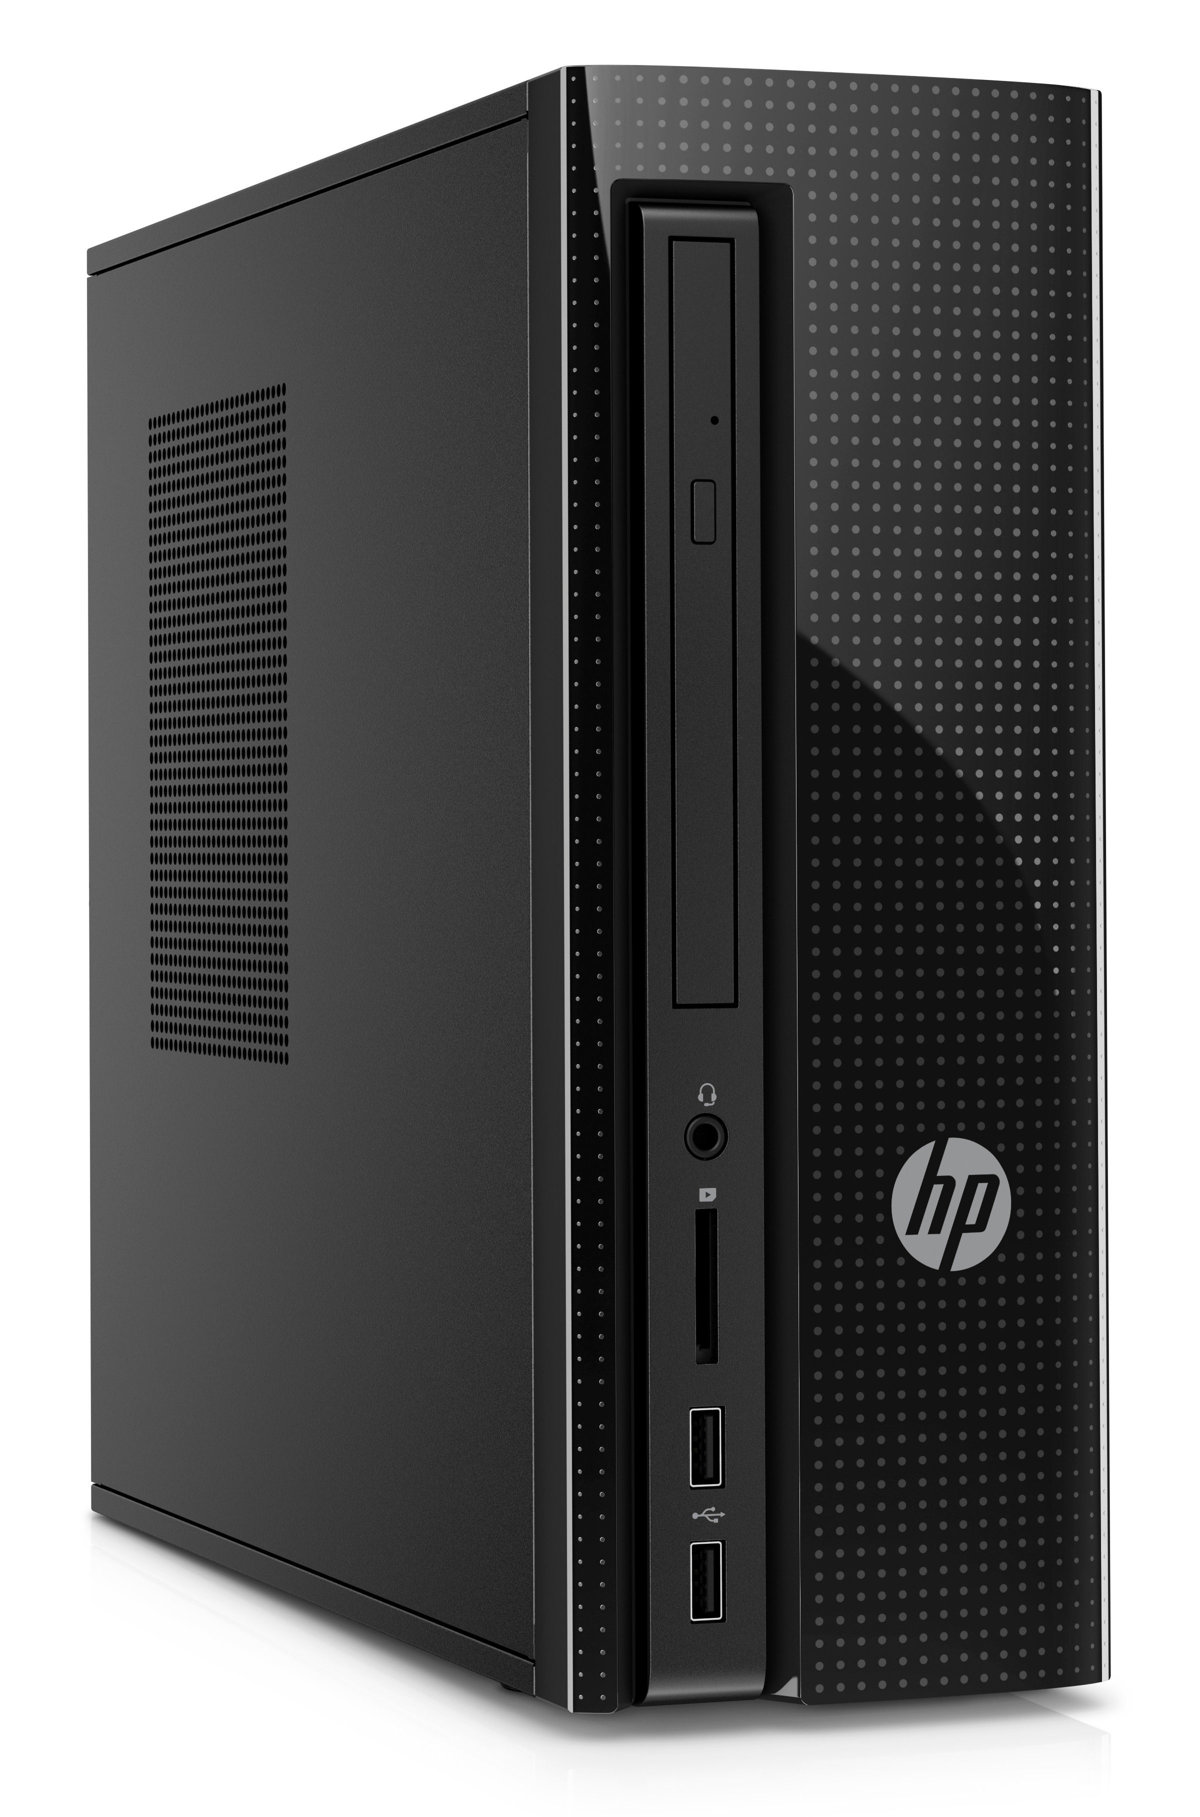 HP Pavilion s7620 HD Audio Driver for Windows Mac